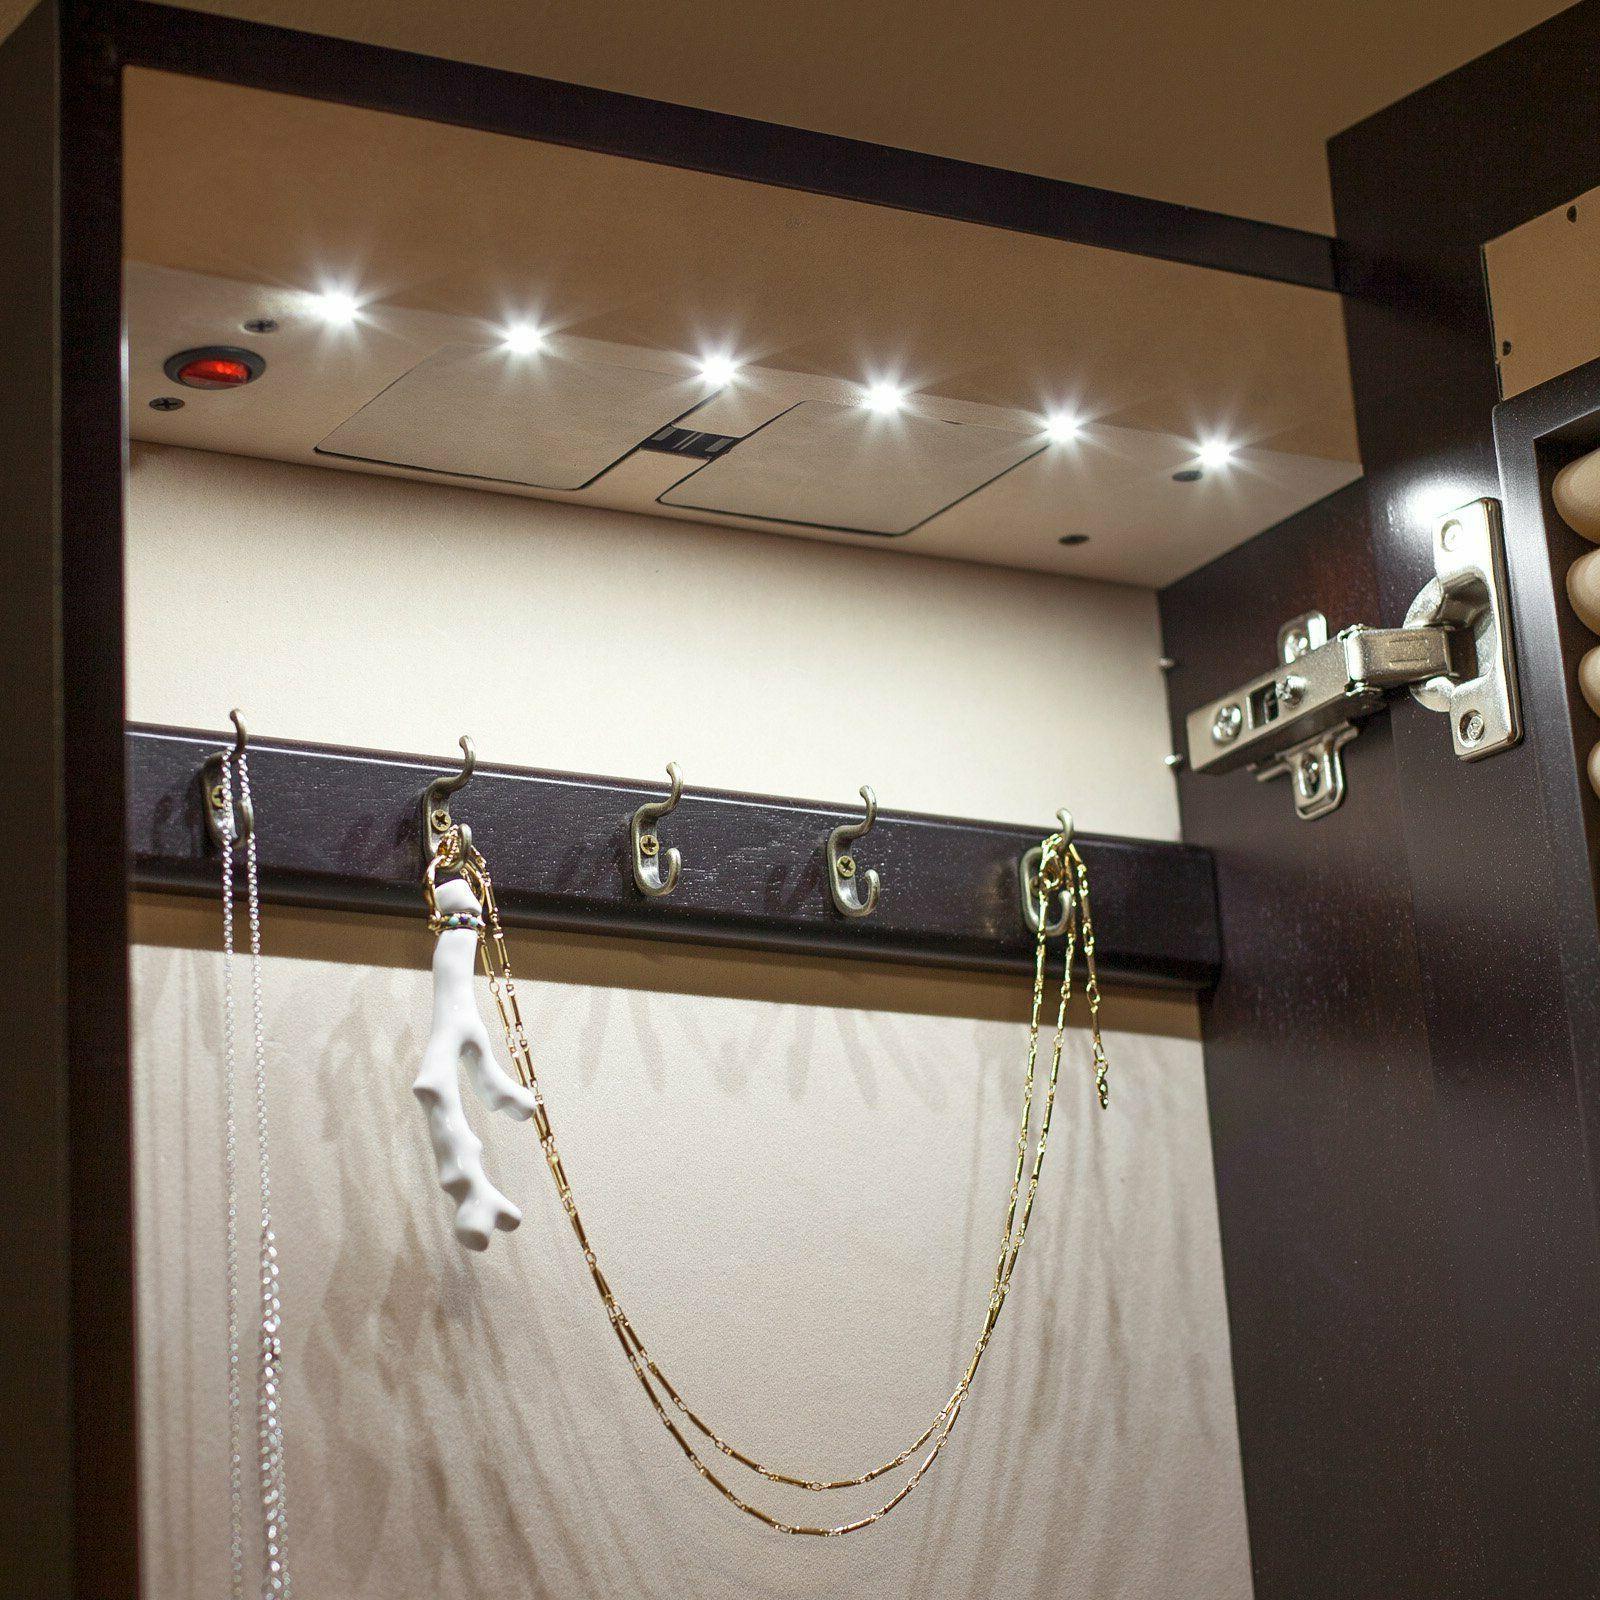 Lighted Jewelry